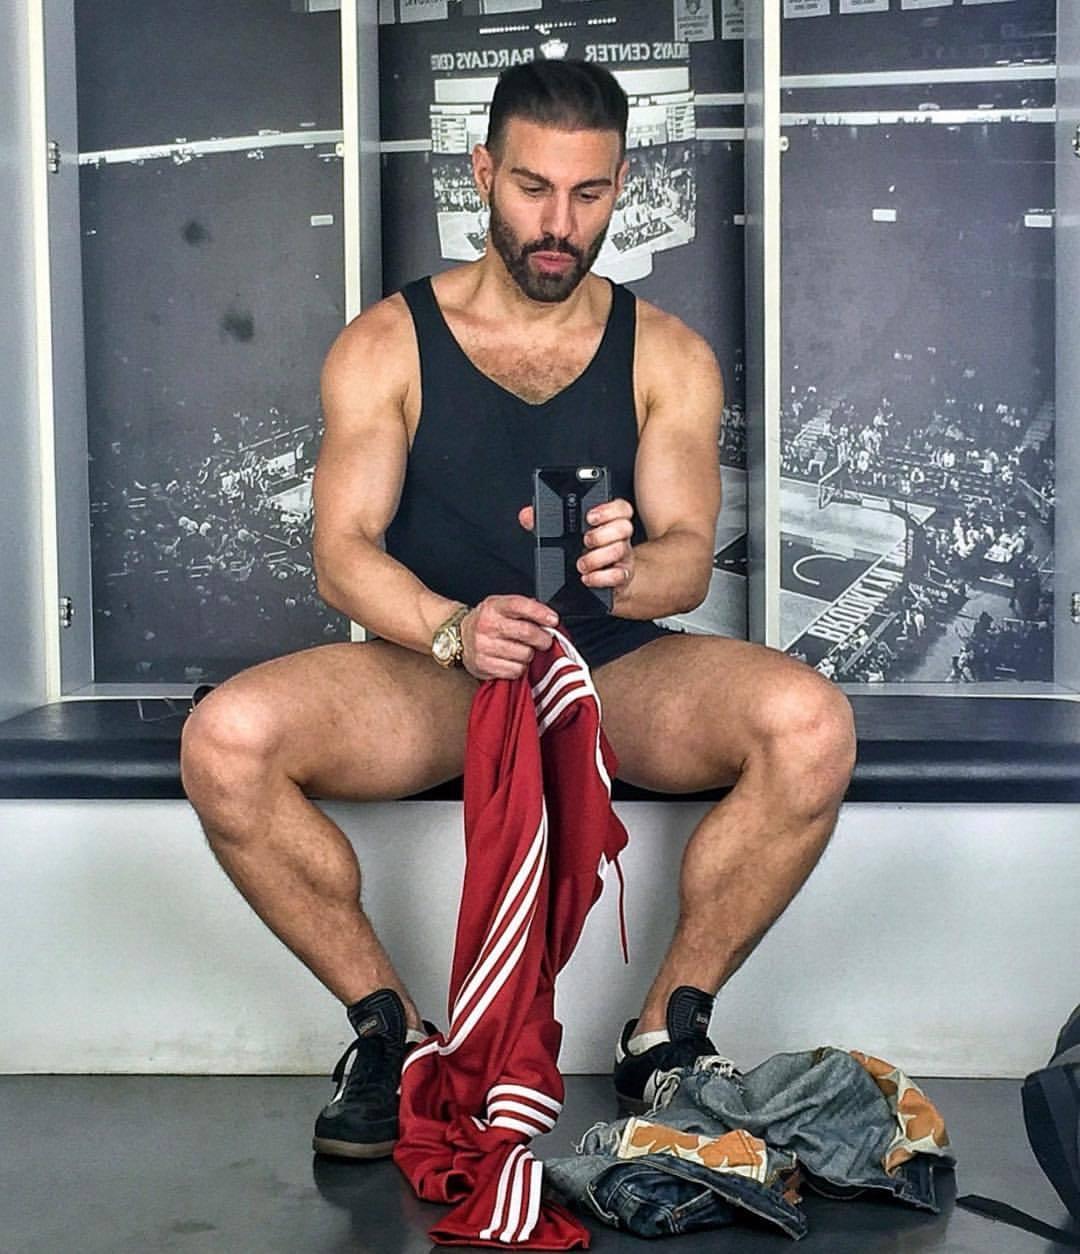 2018-11-23 15:57:42 - gregorynalbone red adidas at adidas beardburnme http://www.neofic.com